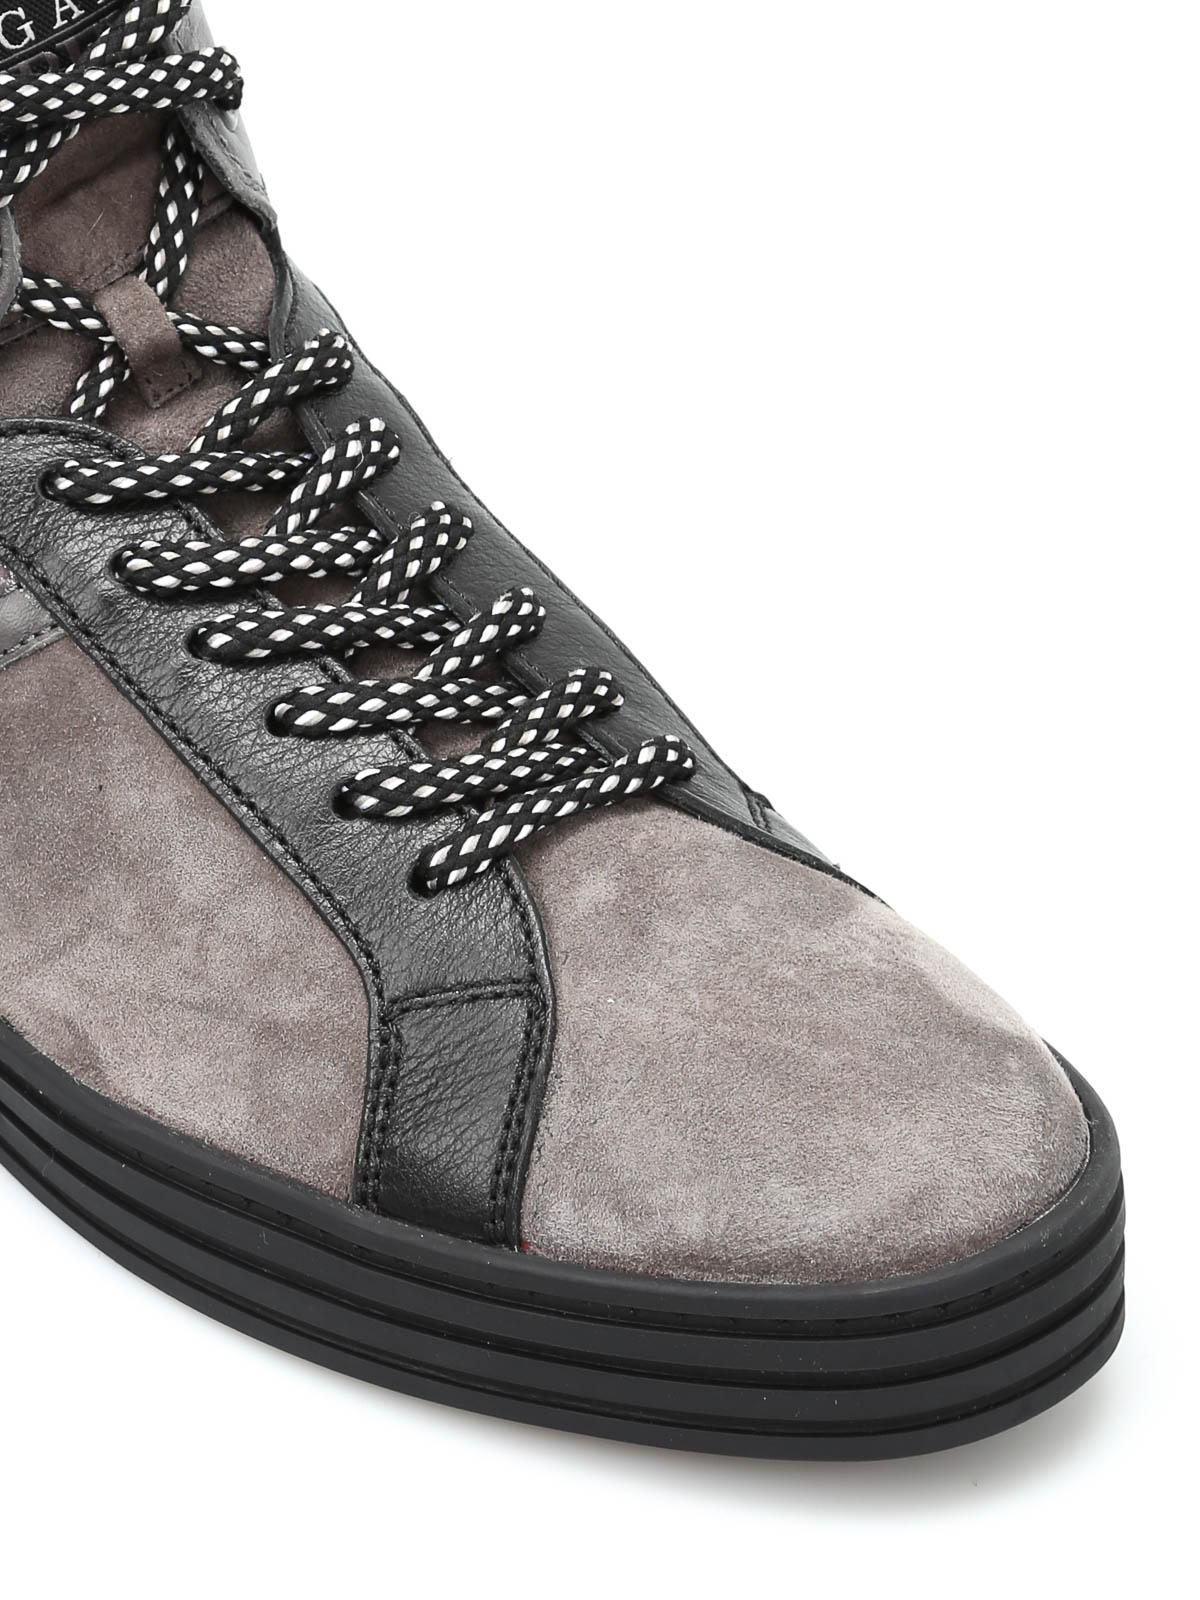 b8a82529a30 iKRIX HOGAN REBEL  trainers - R141 high-top basket sneakers